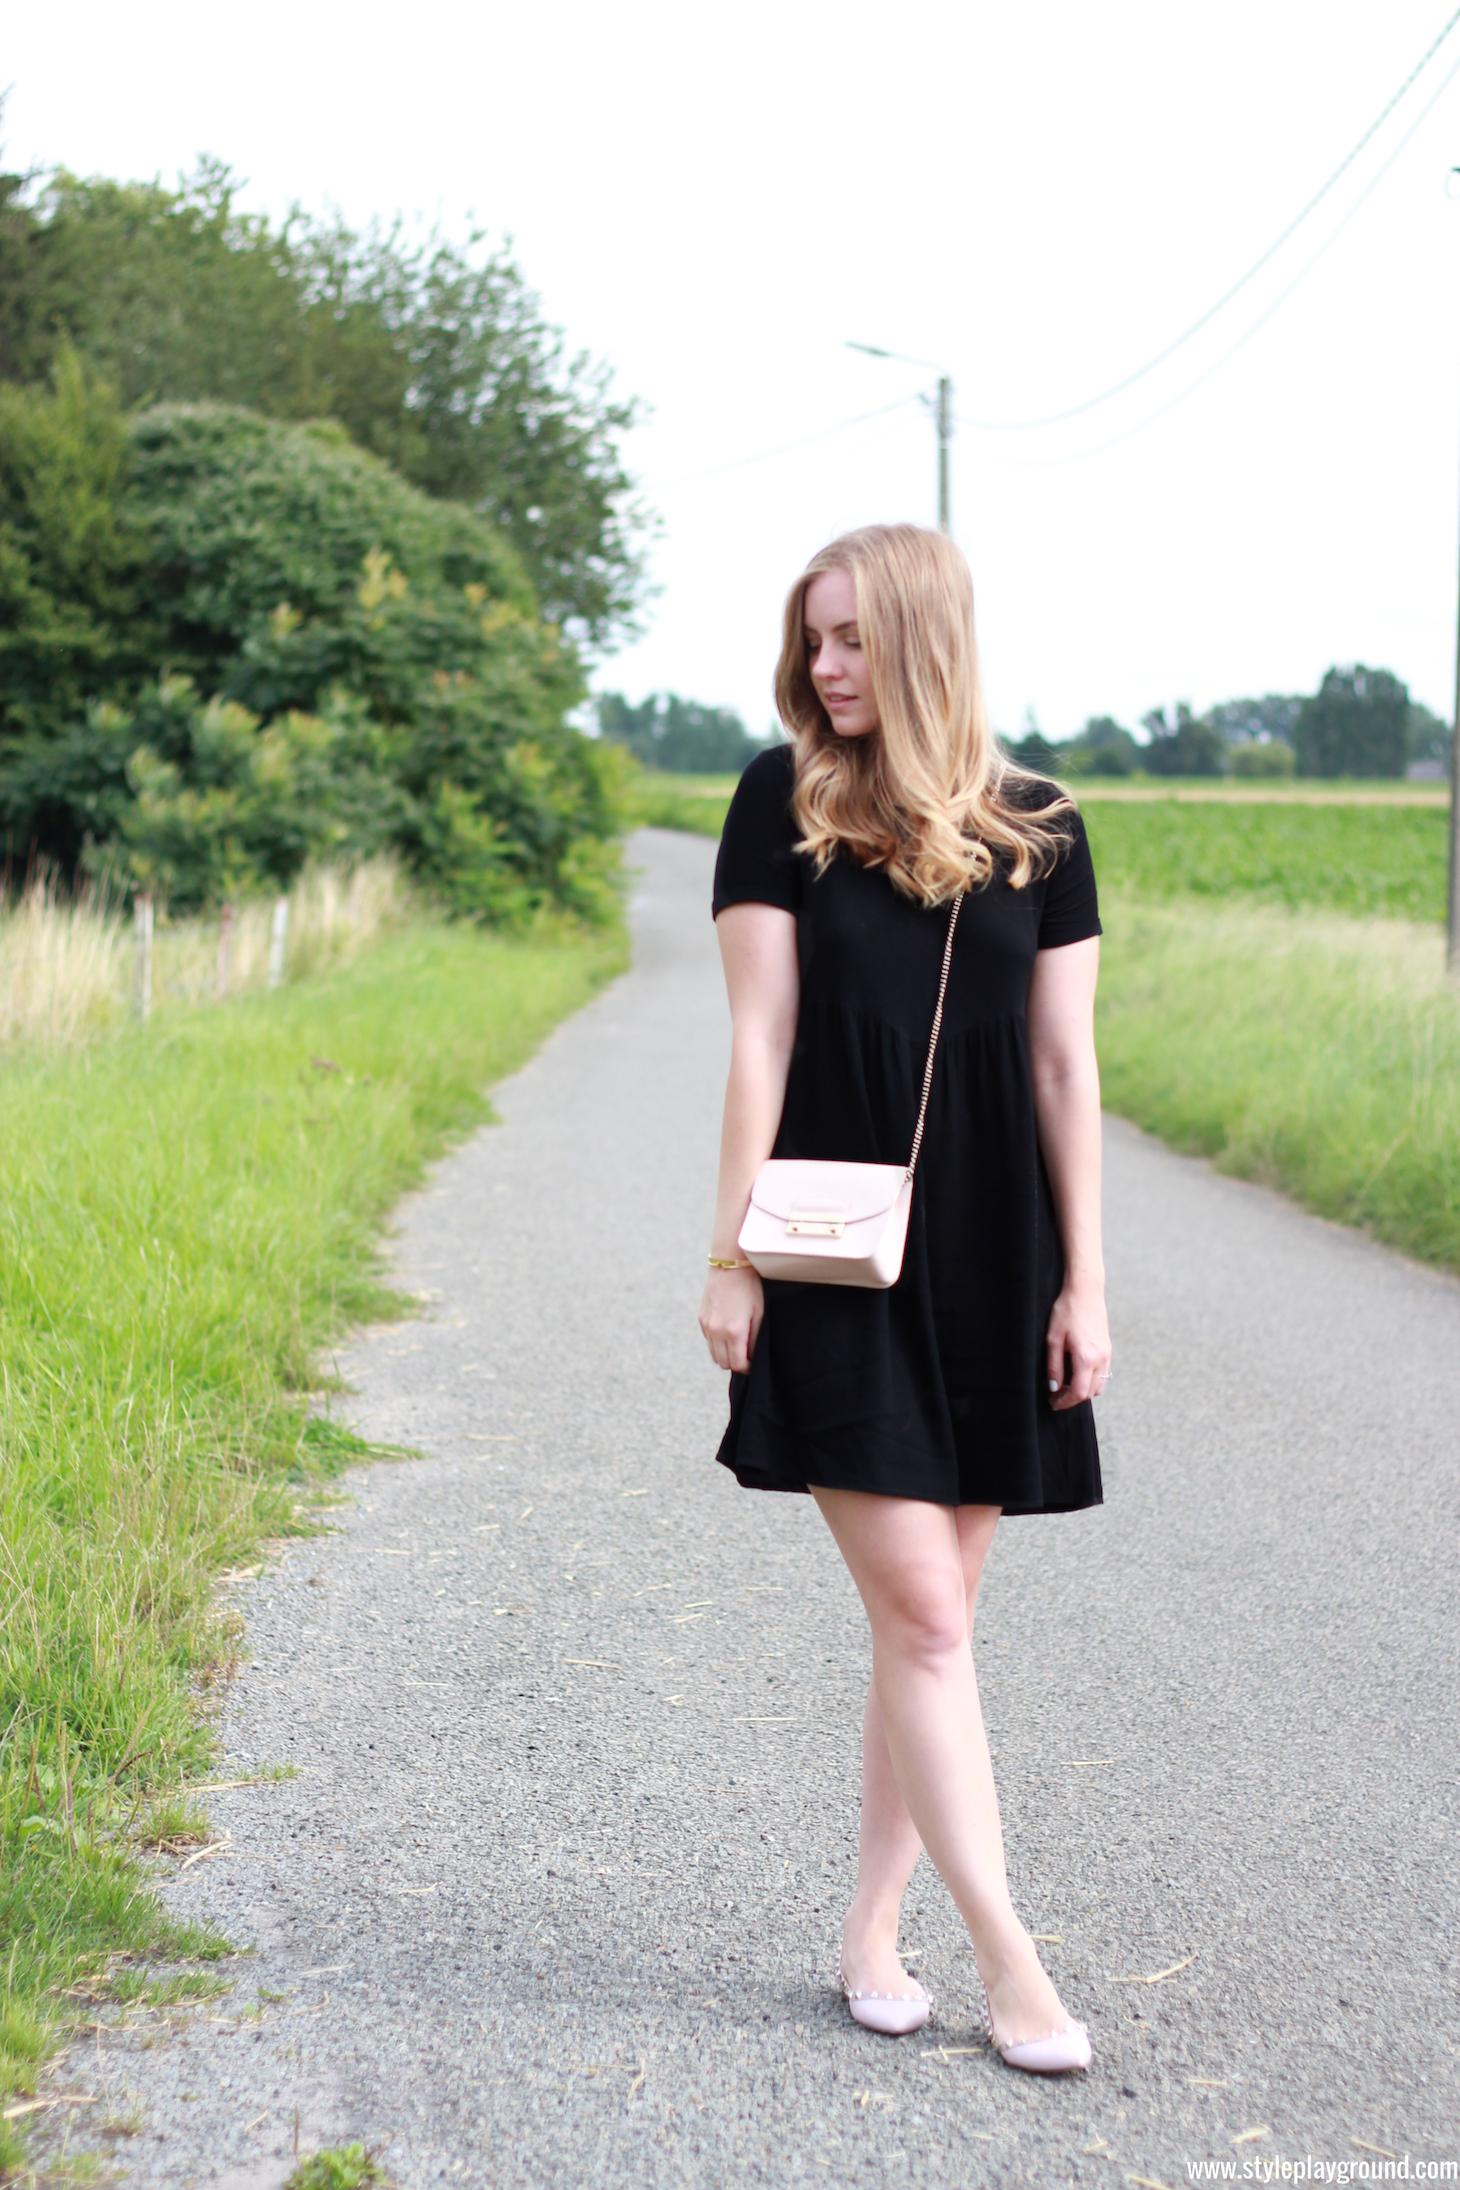 Axelle Blanpain of Style playground is wearing a Bash dress, Furla mini metropolis bag, Valentino rock stud flats, Cartier love bracelet & Tiffany T bracelet